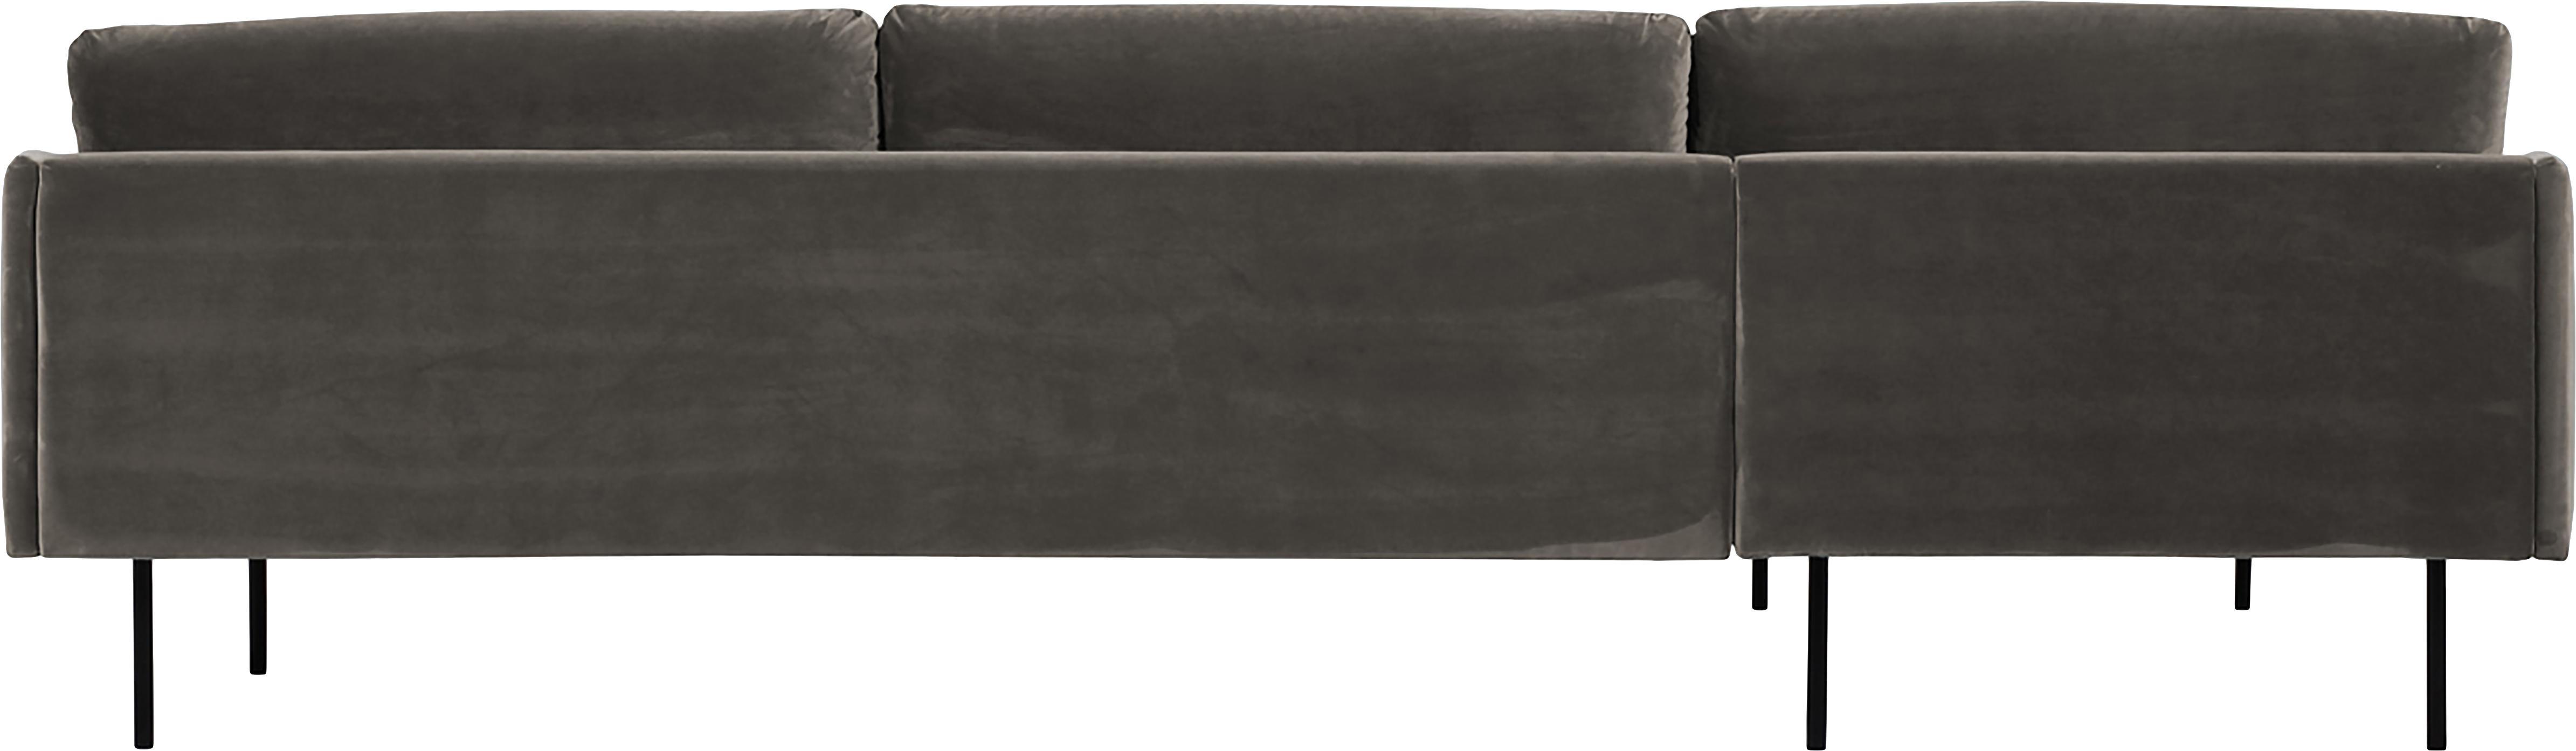 Samt-Ecksofa Moby, Bezug: Samt (Hochwertiger Polyes, Gestell: Massives Kiefernholz, Füße: Metall, pulverbeschichtet, Samt Braungrau, B 280 x T 160 cm